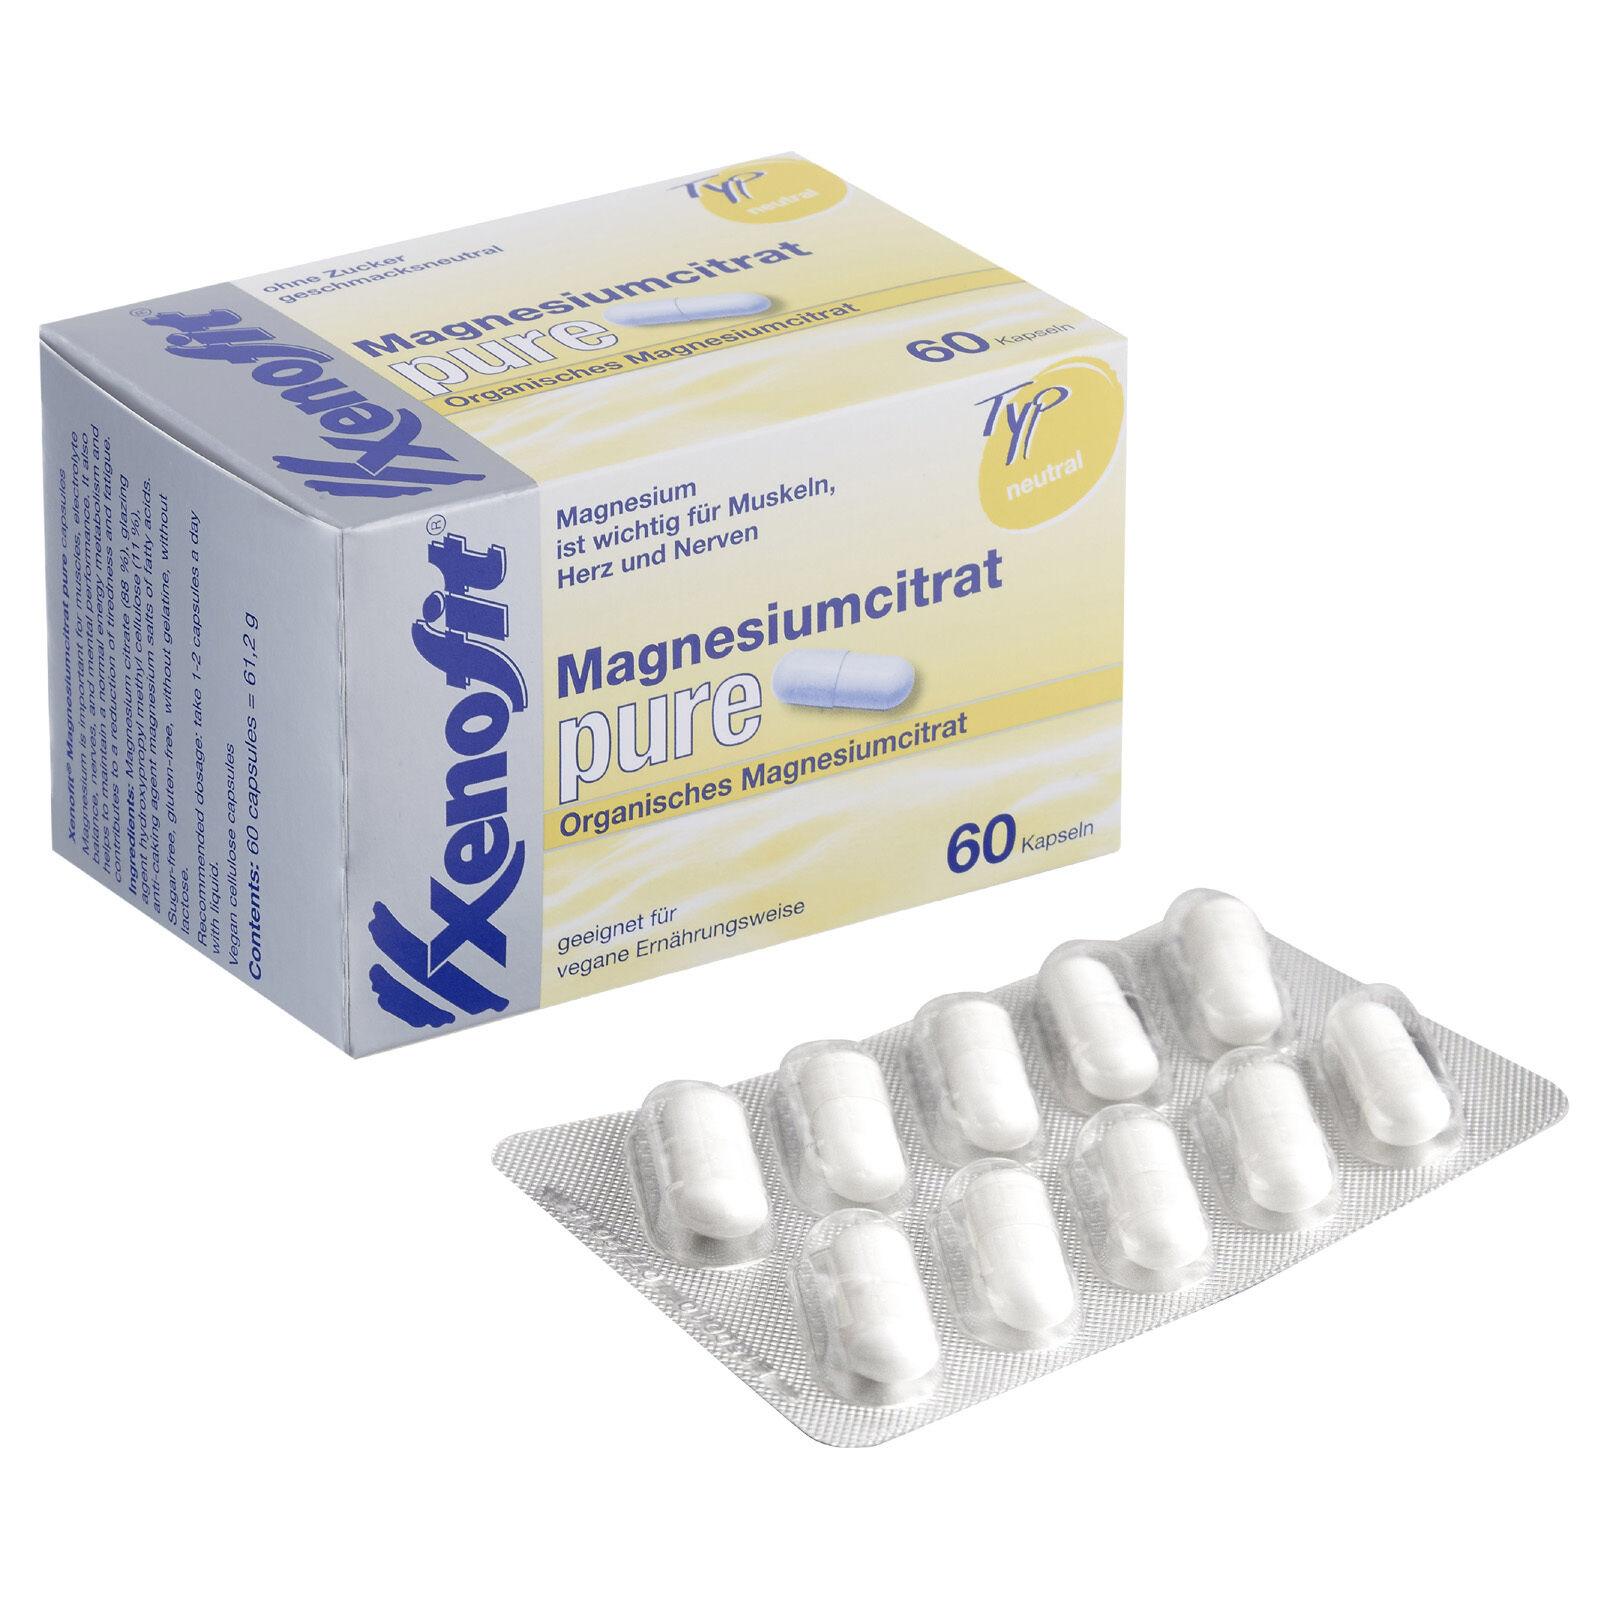 Xenofit Magnesiumcitrat pure (Kapseln)